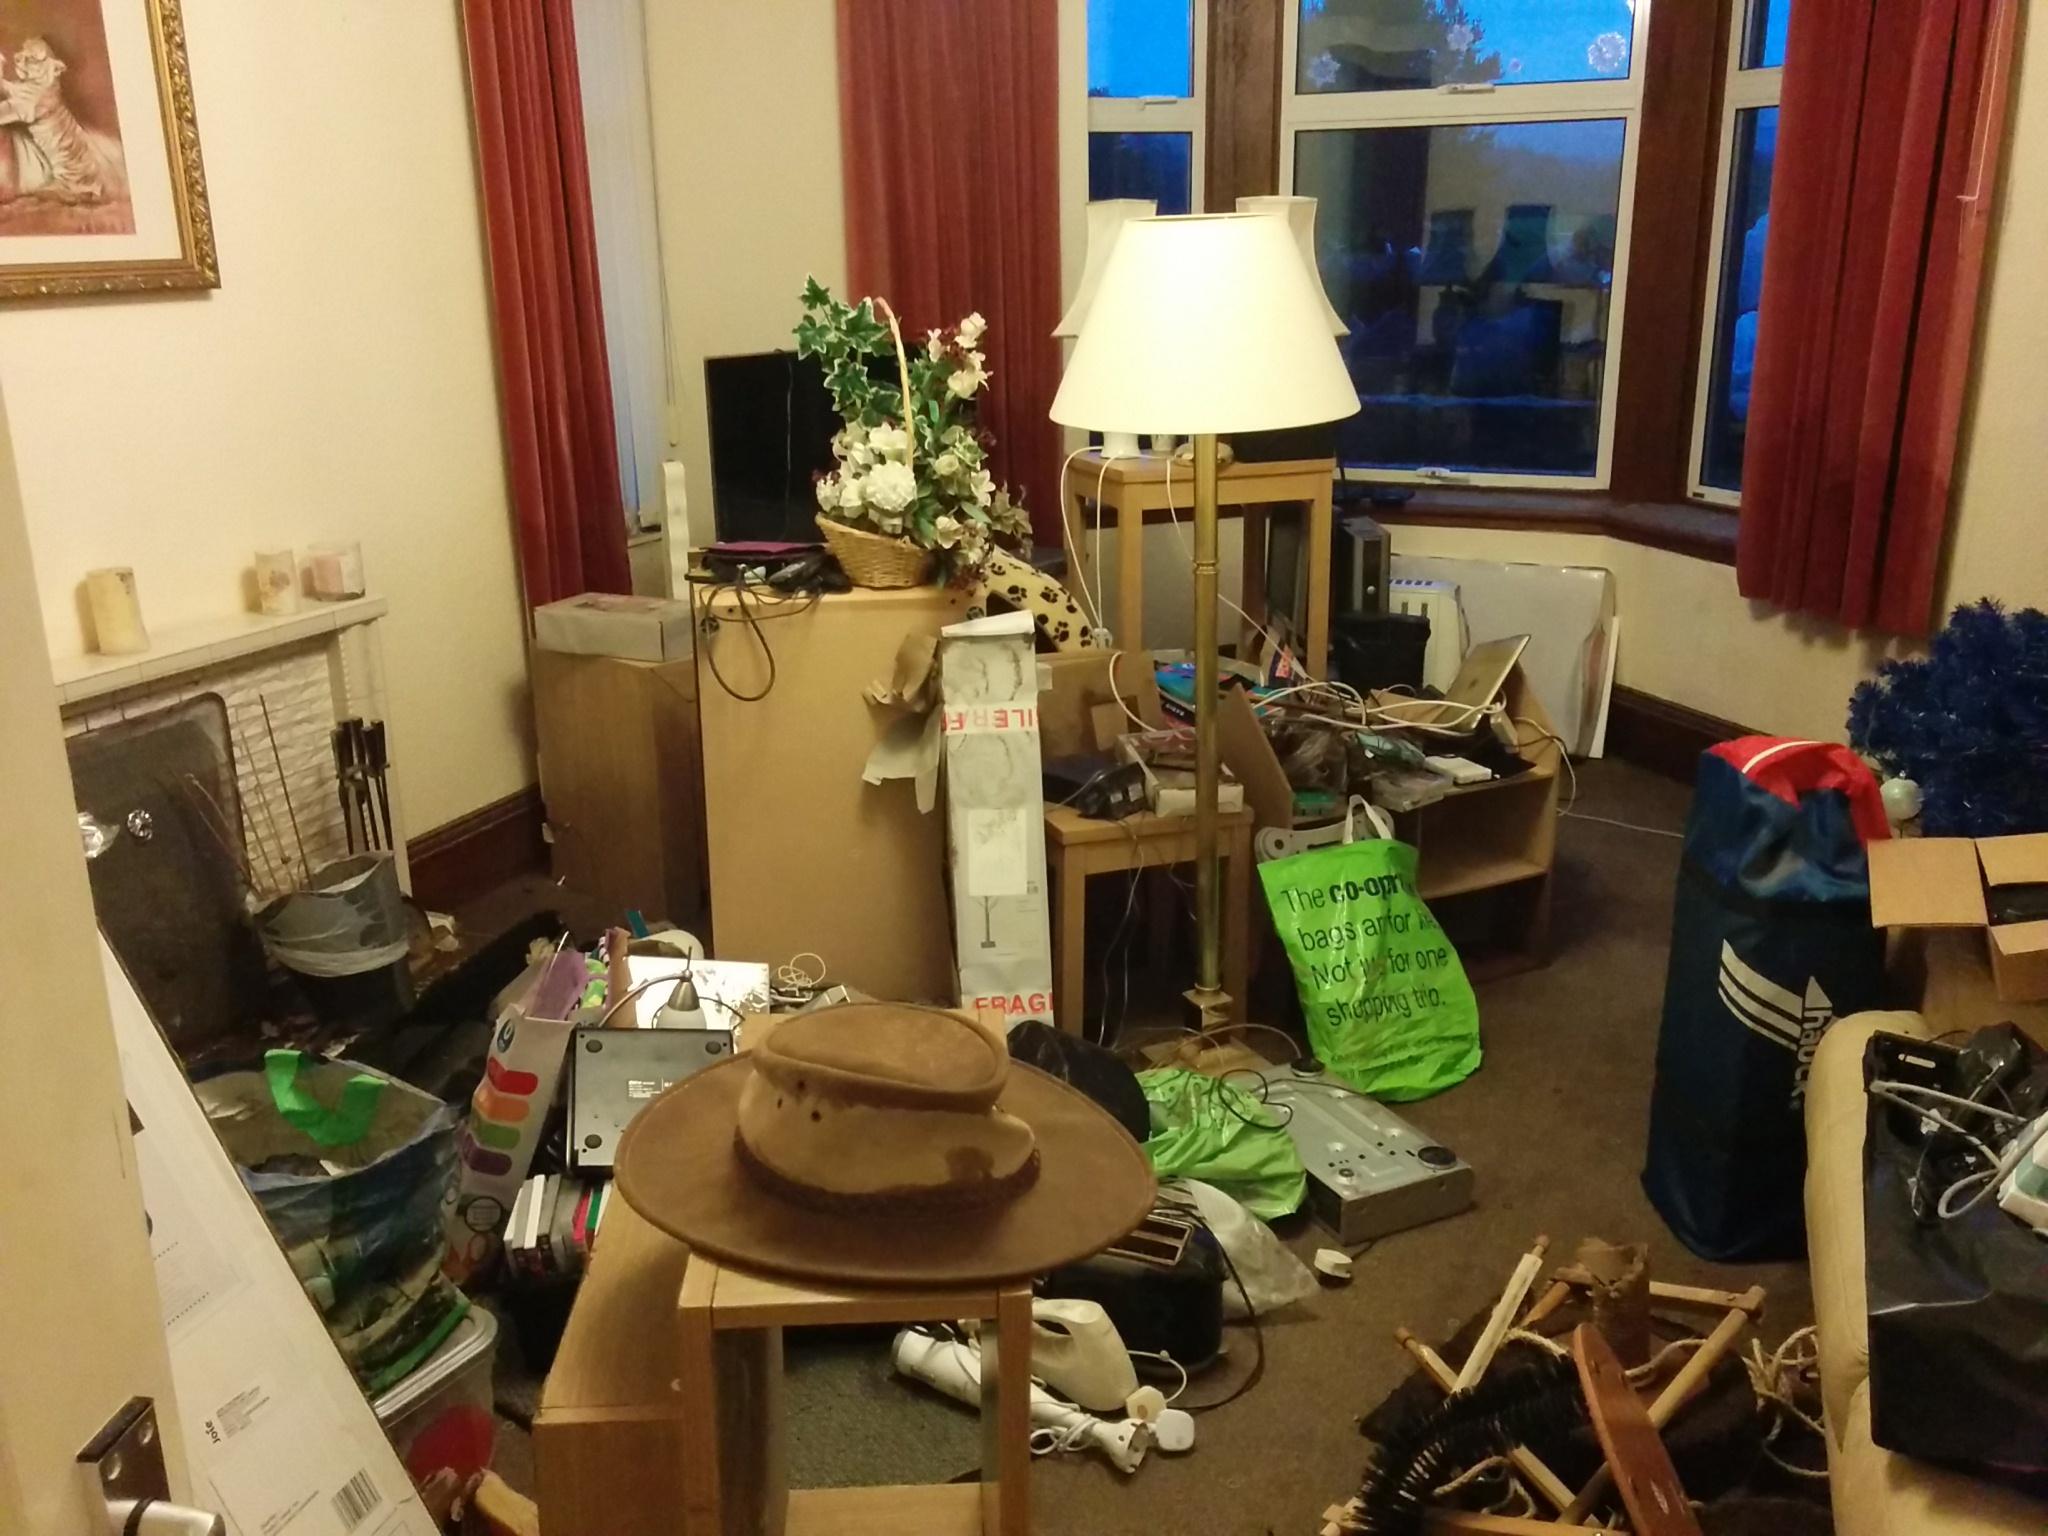 Ian Payne's living room